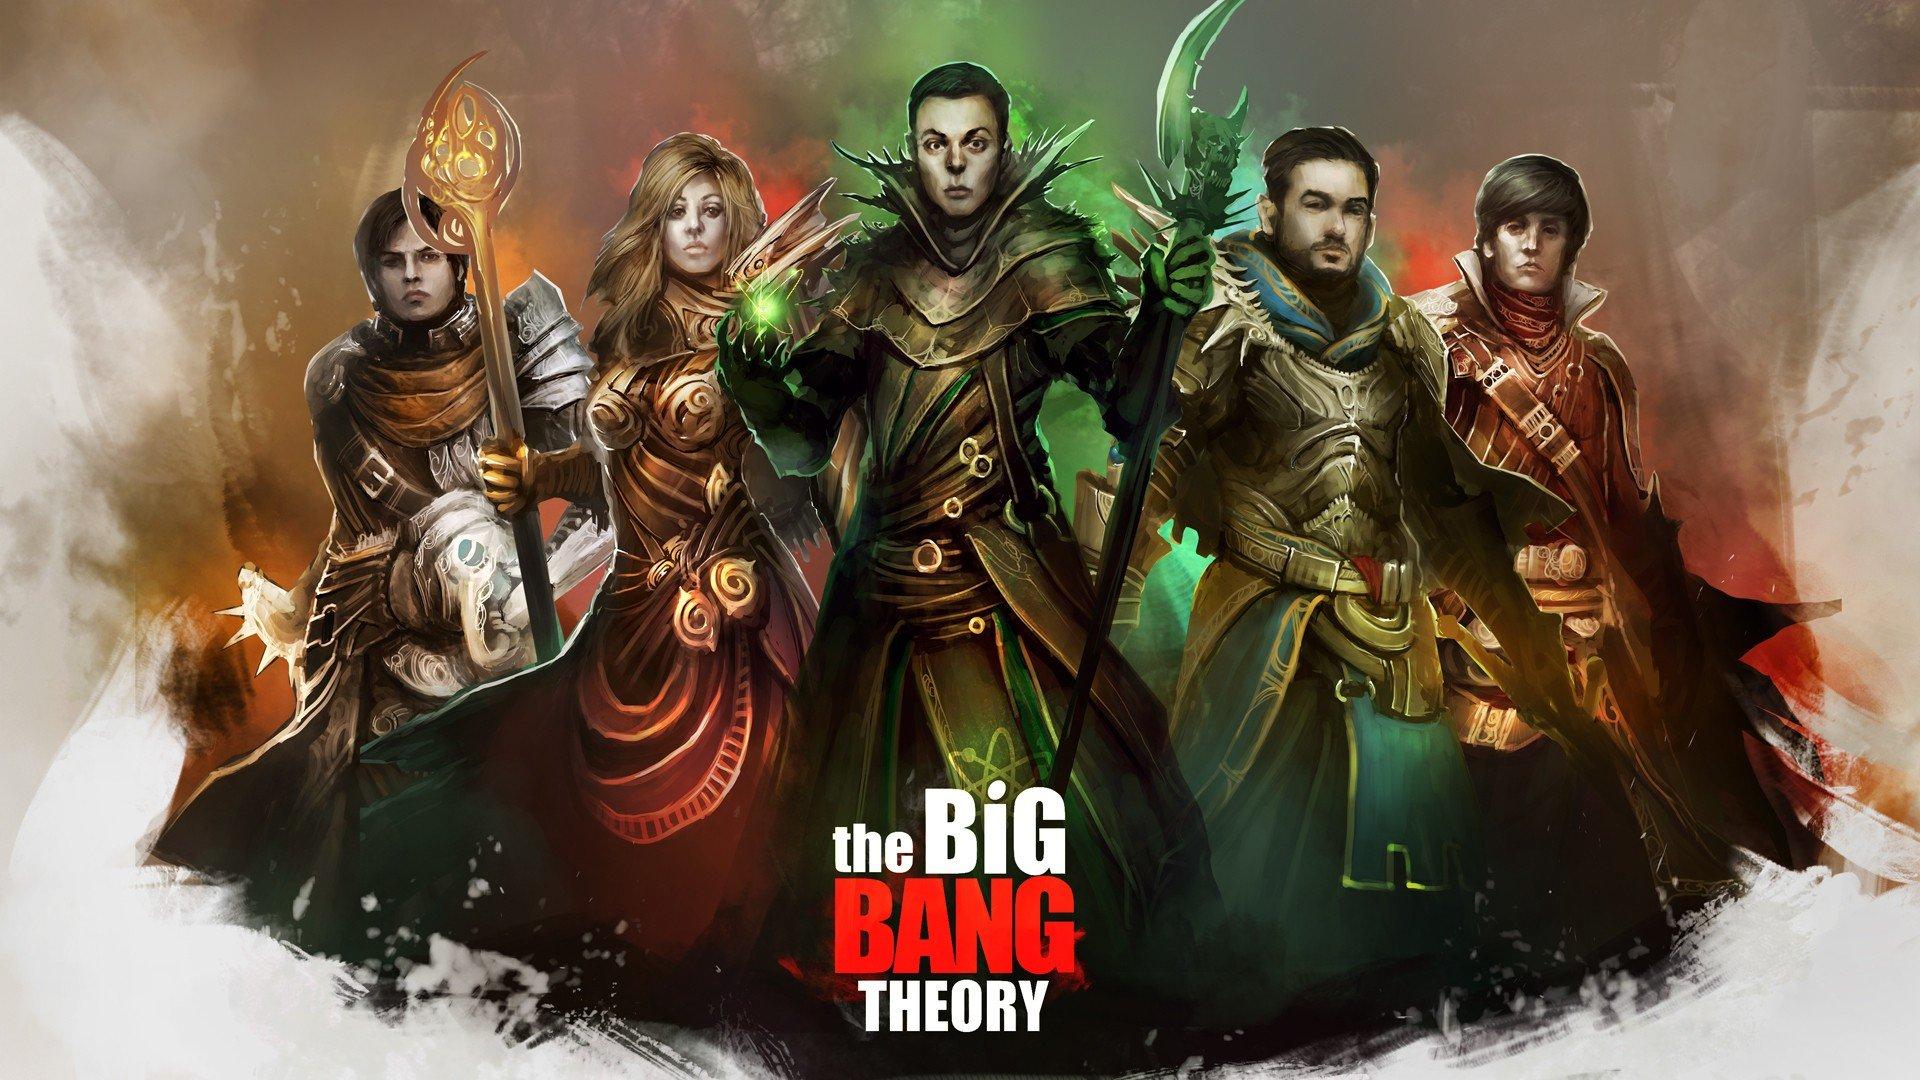 Wallpaper 1920x1080 Px Drawing The Big Bang Theory 1920x1080